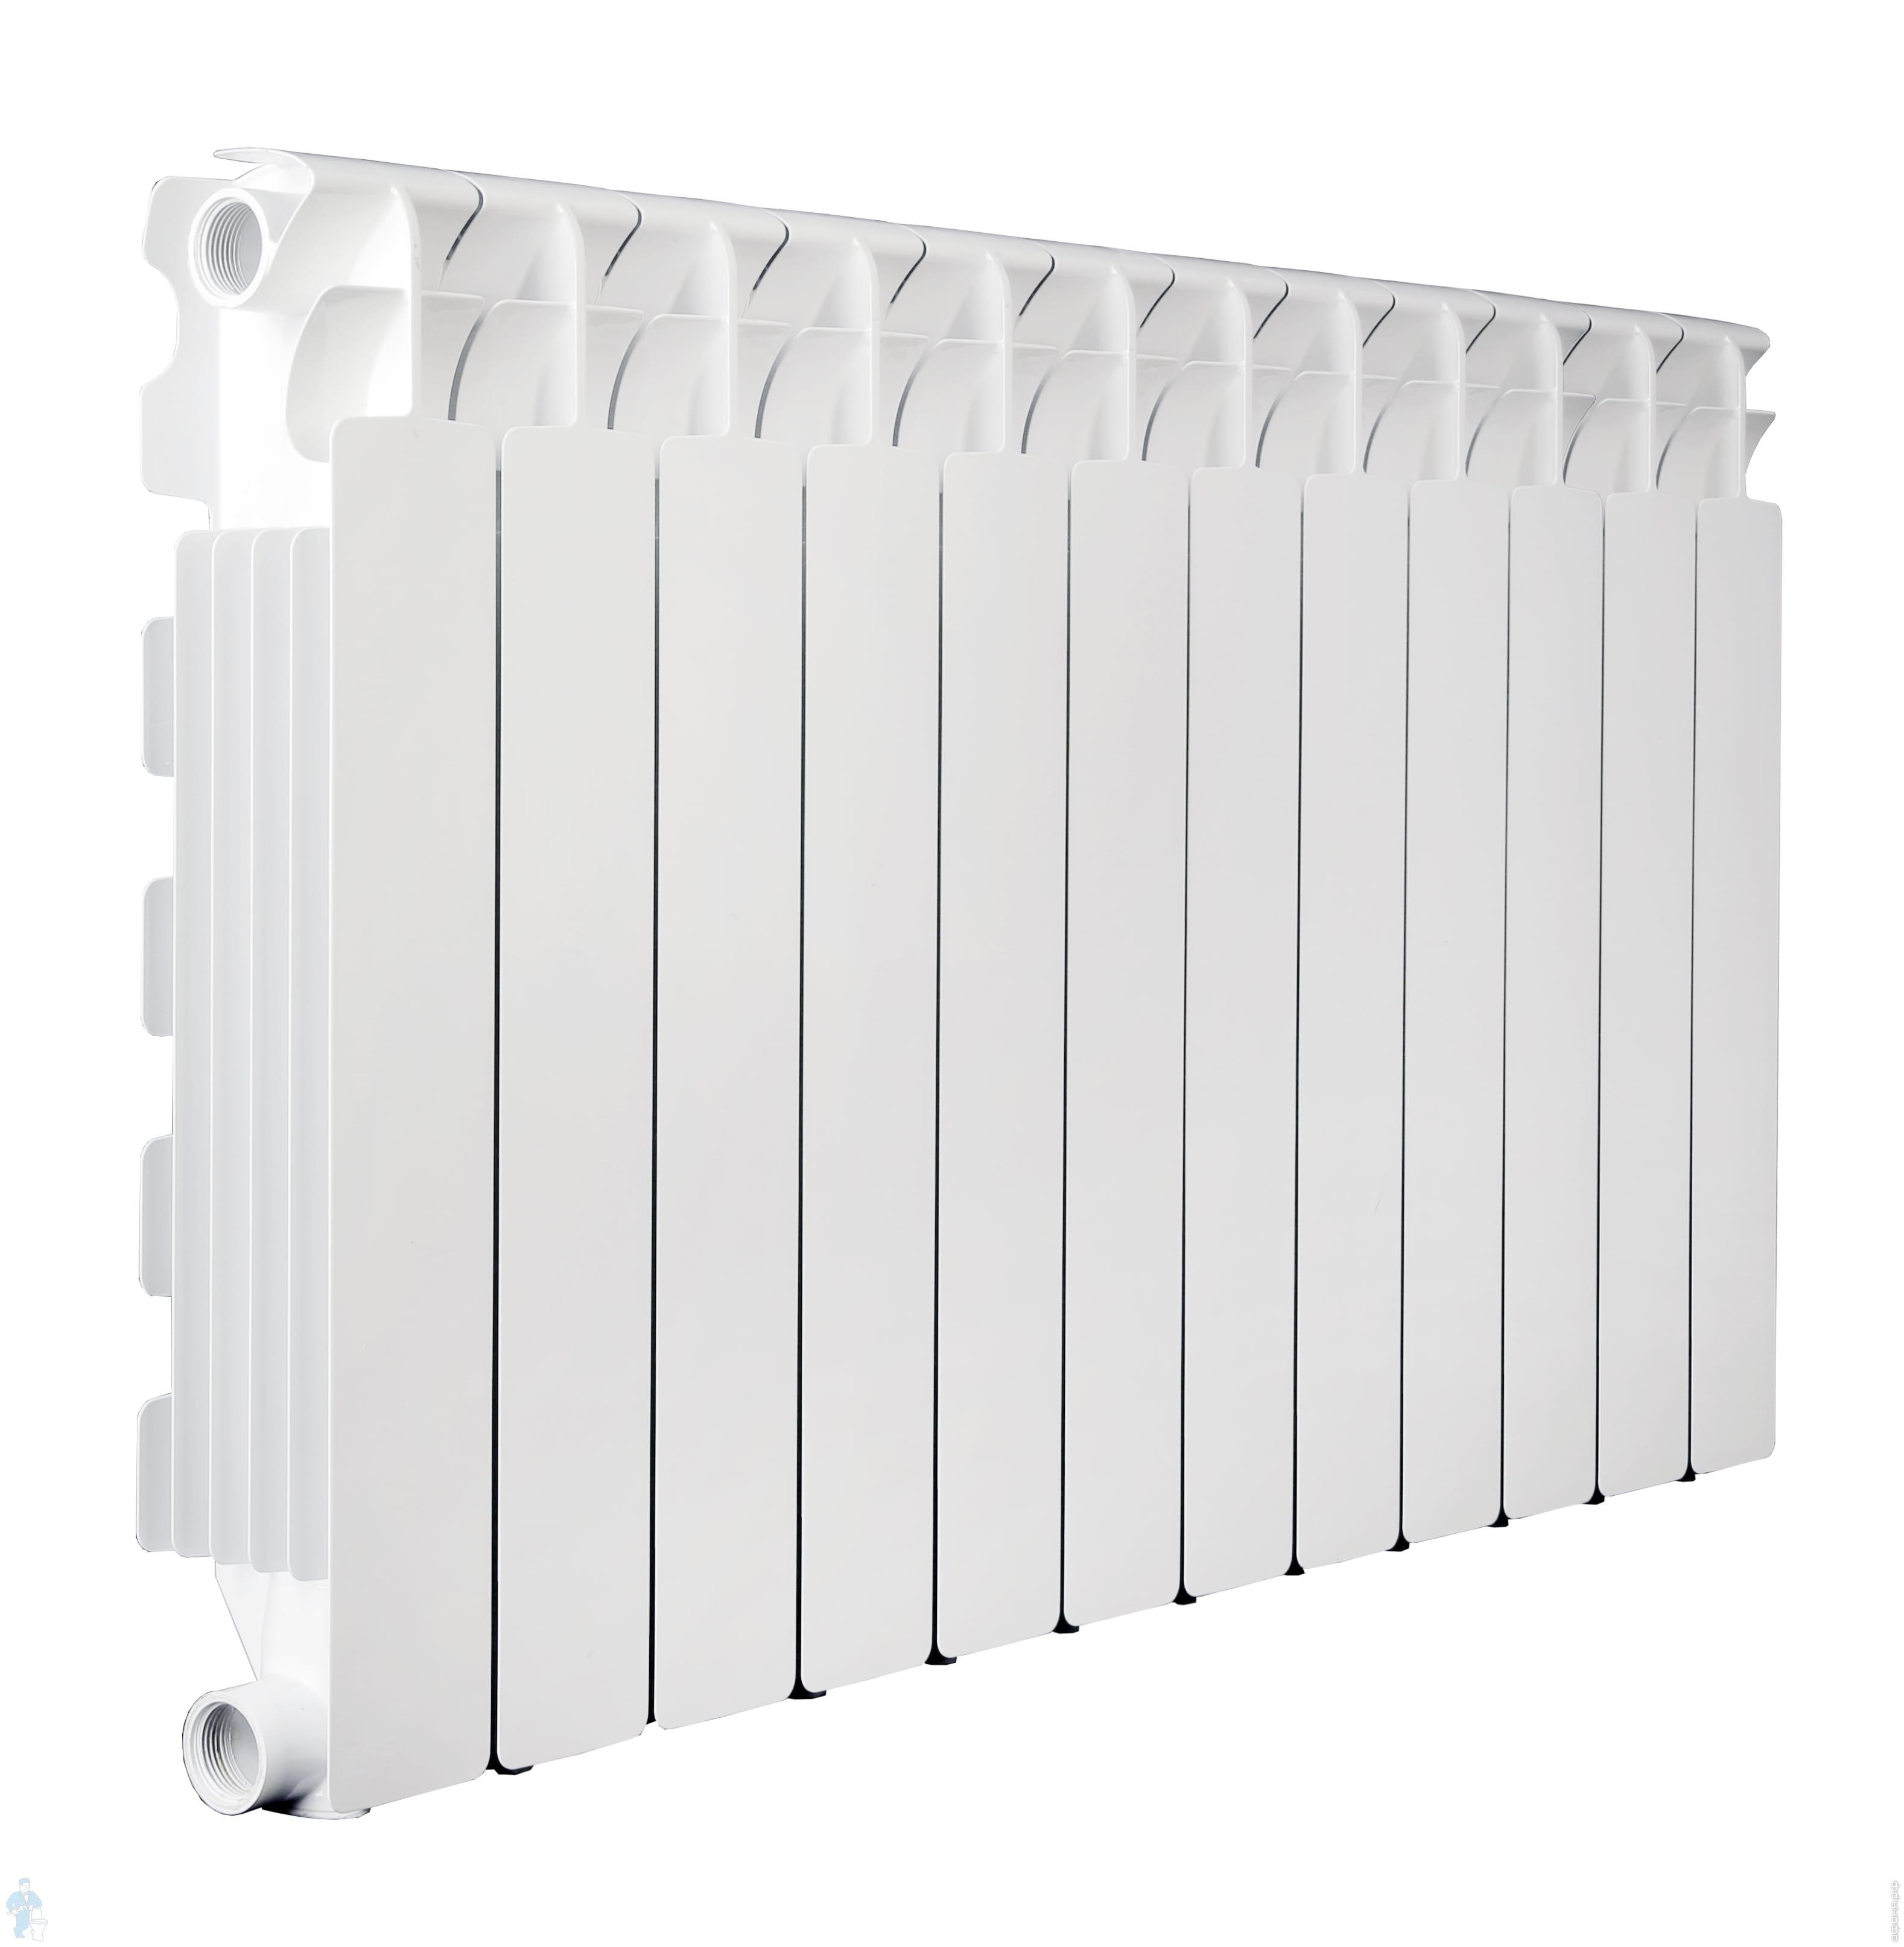 Радиатор алюминиевый Fondital Aleternum B4 500/100 (97х558) белый 12 секций, 2290,8 Ватт | Афоня.рф, цена 14 208 руб.